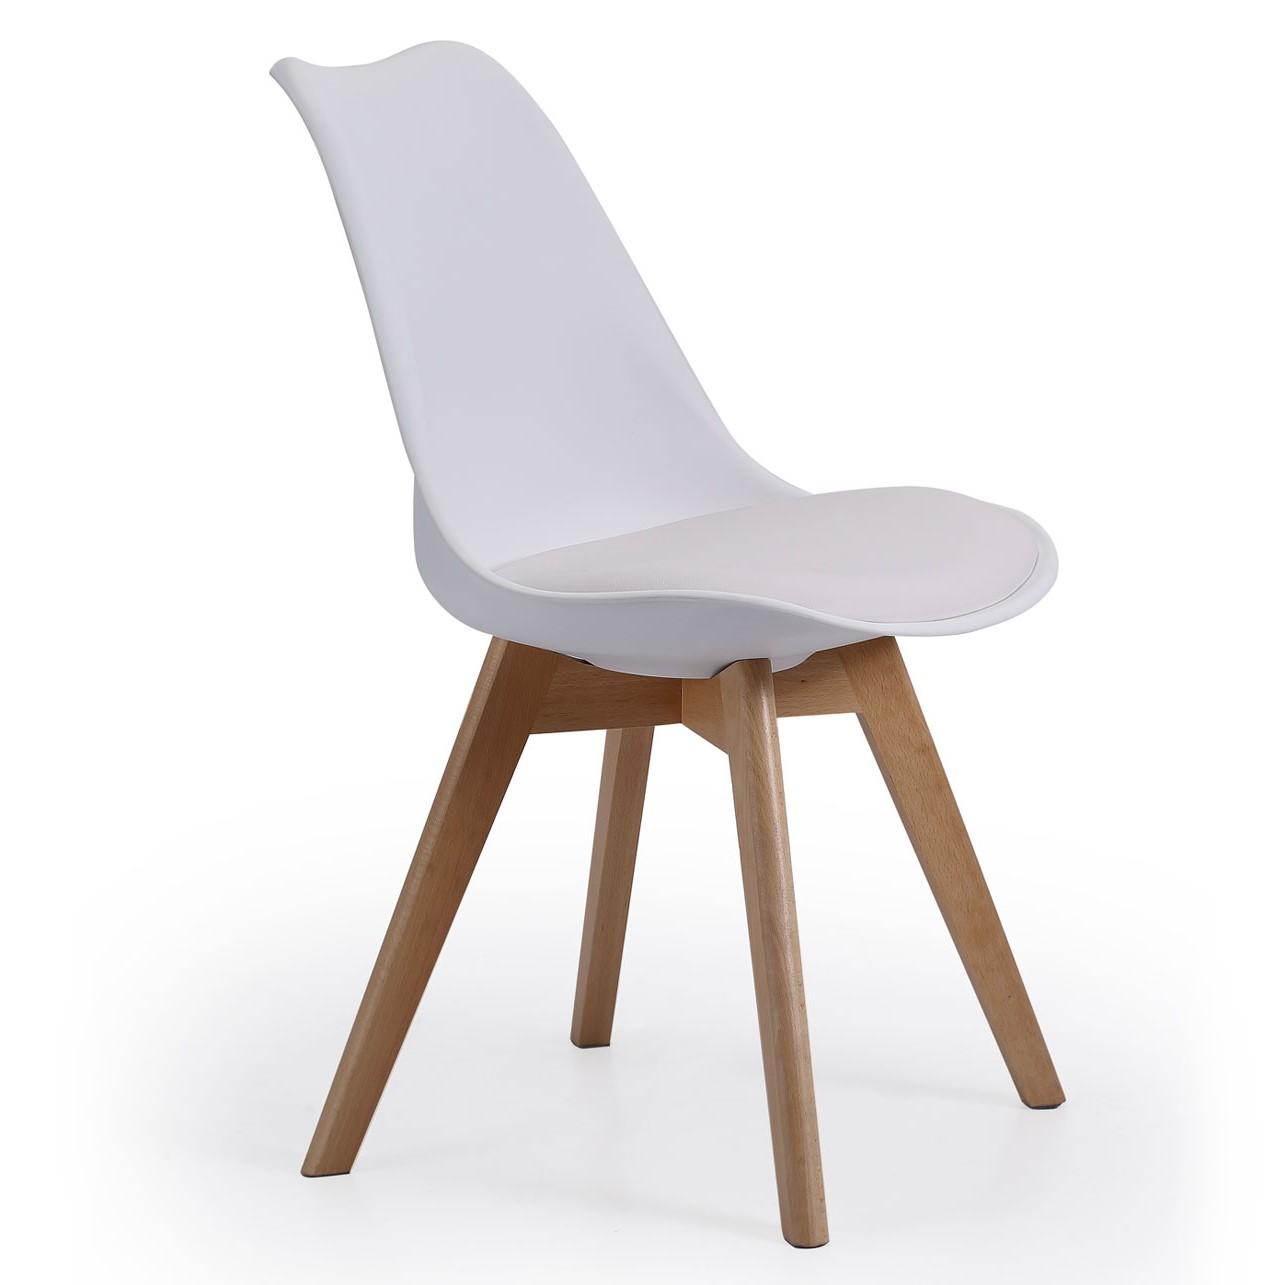 30196-silla-bistro-blanco.jpg